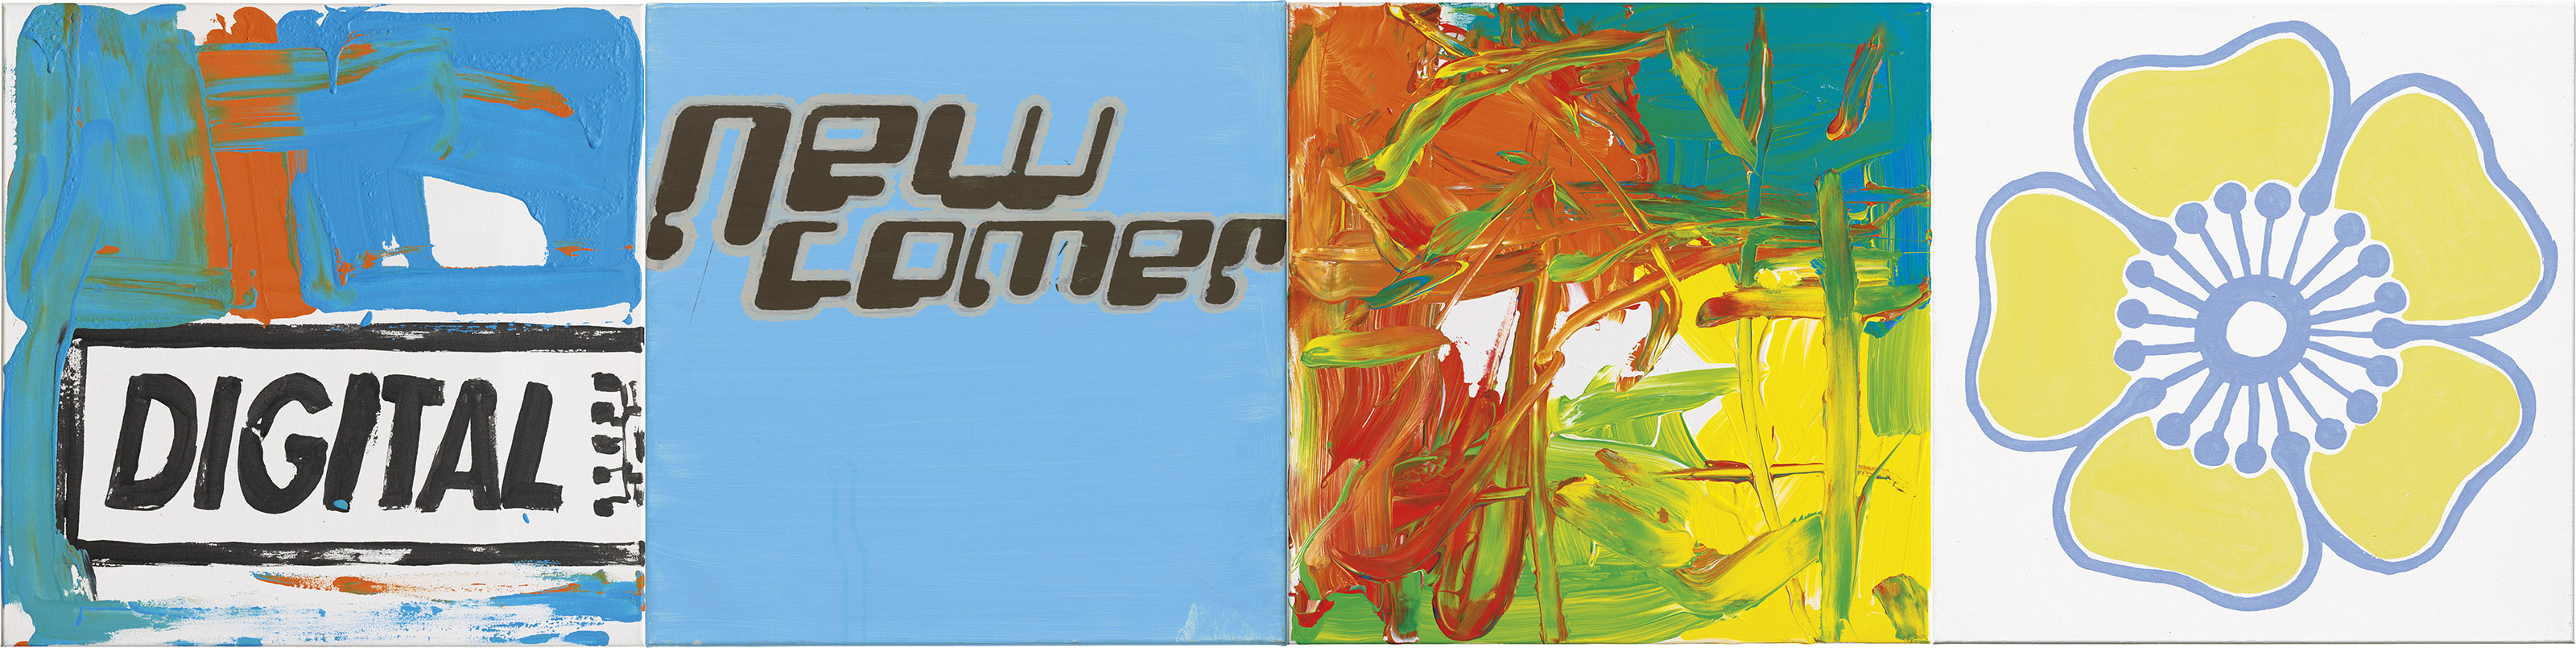 (i) Untitled, 664, (ii) Untitled, 666, (iii) Untitled, 903, (iv) Untitled, 904